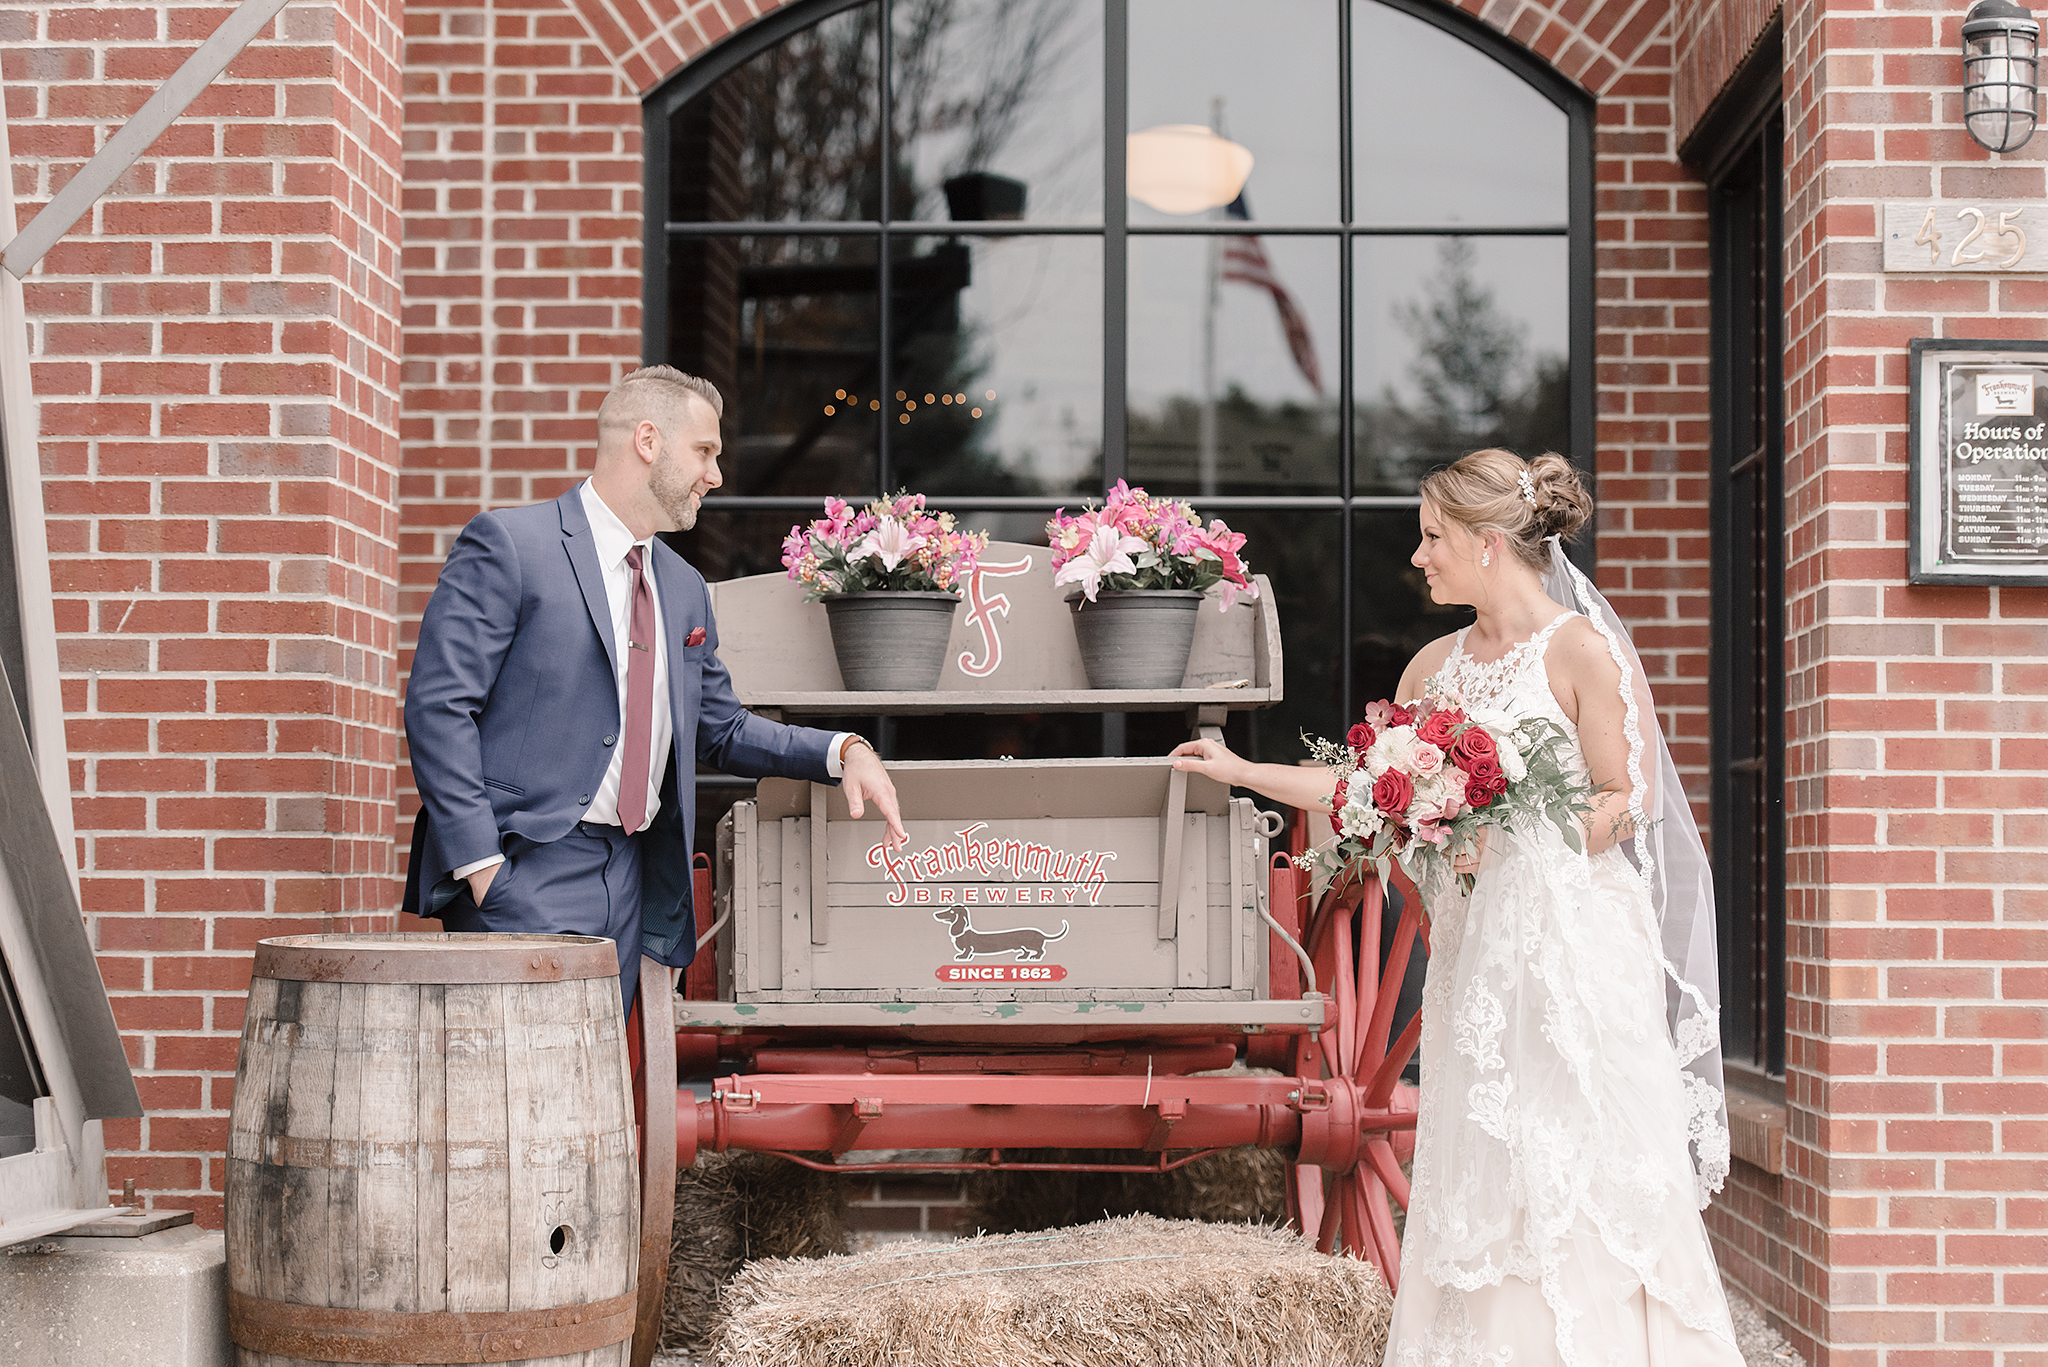 LINDSAY-ADKINS-PHOTOGRAPHY-MICHIGAN-WEDDING-PHOTOGRAPHER-FRANKENMUTH-BREWERY-WEDDING-MICHIGAN-BLOG-27